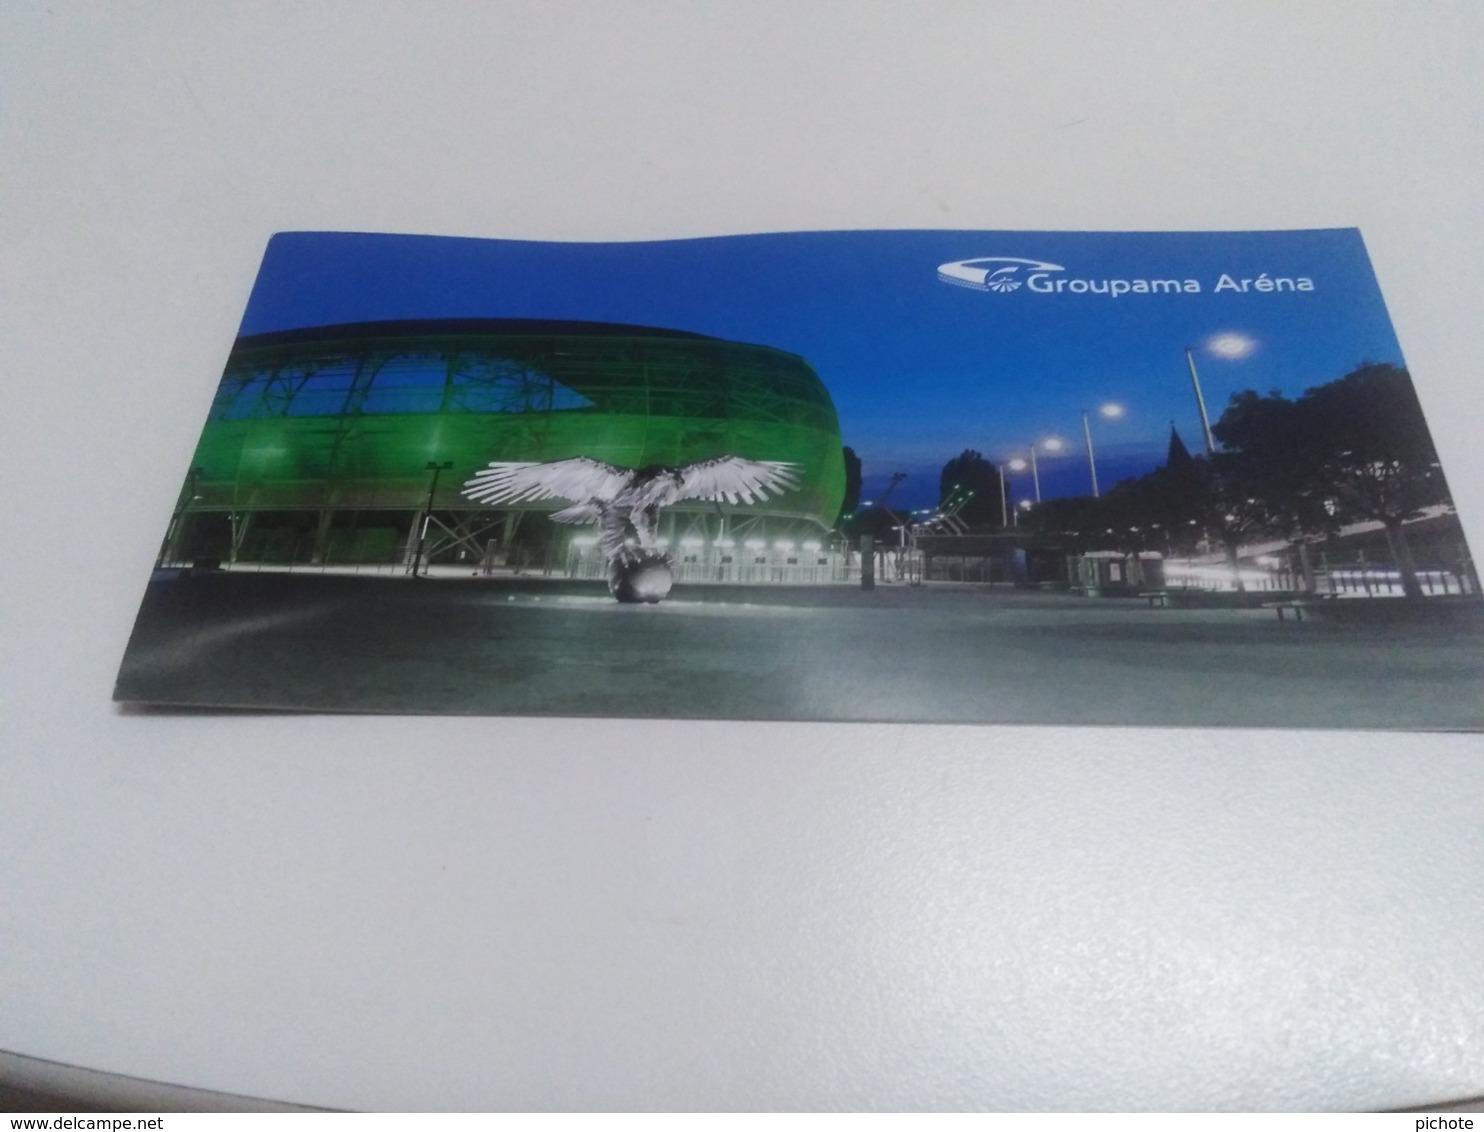 Estadio/Stadium /stadion/Stade Groupama Aréna Ferencváros (Hungría) - Fútbol